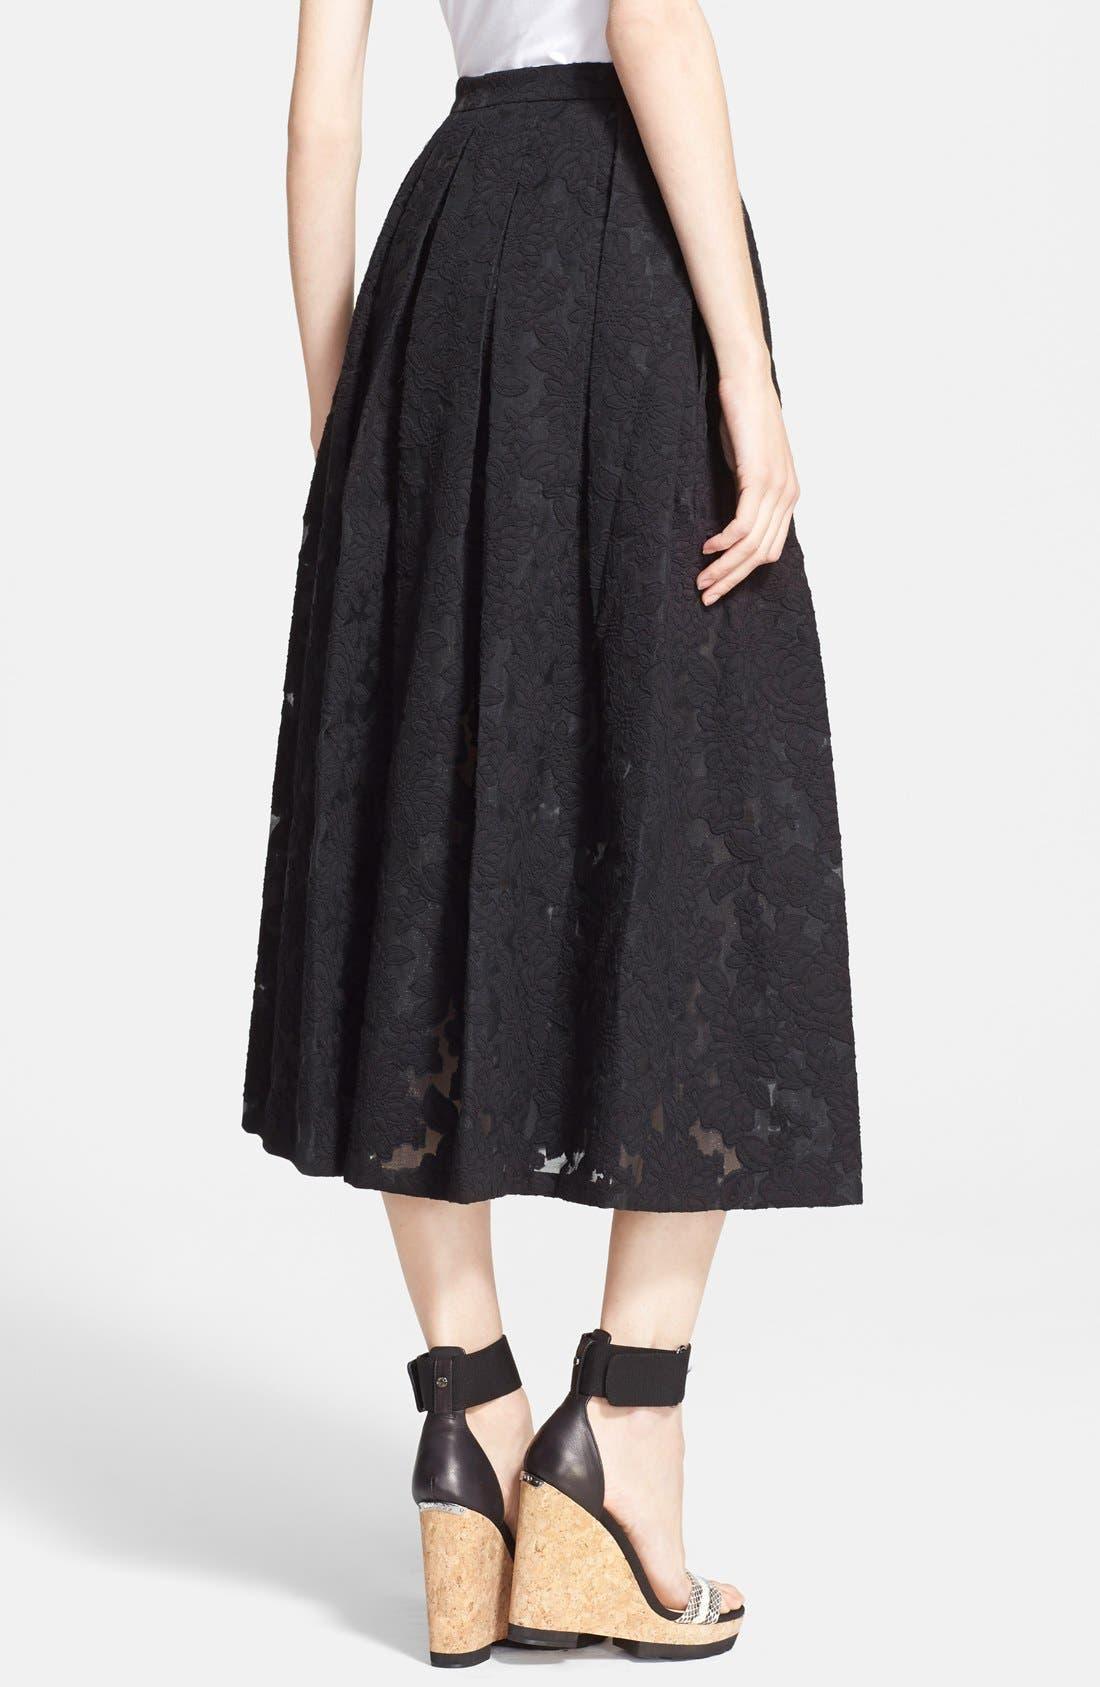 MICHAEL KORS, Floral Embroidered Pleated Midi Skirt, Alternate thumbnail 4, color, 001